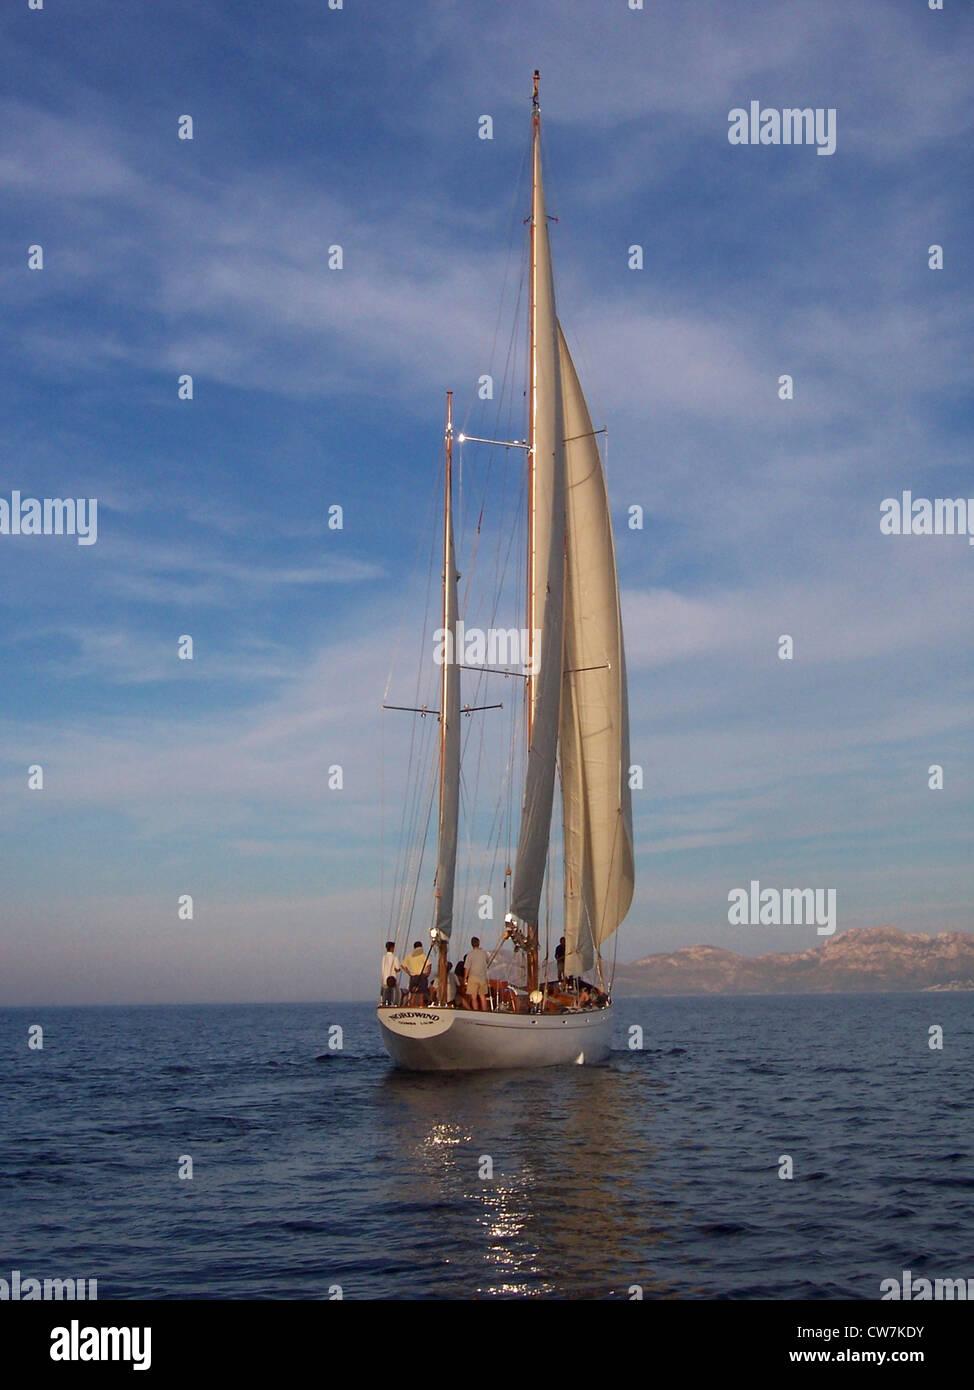 tourists on a sailing ship, Spain, Balearen, Majorca - Stock Image